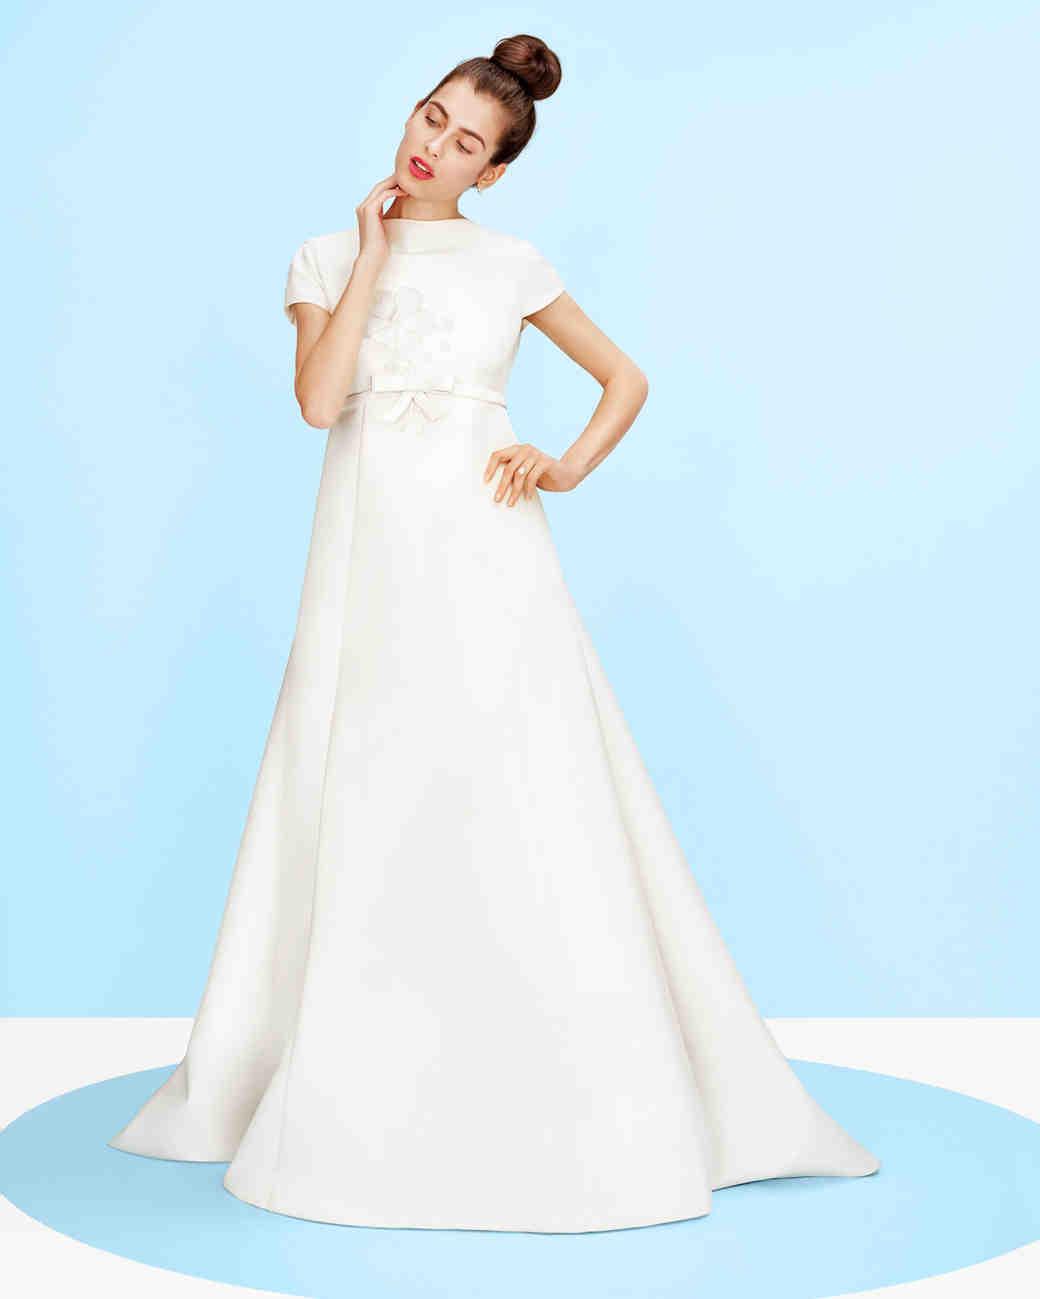 1daf07ba7ed3a A Guide to Every Wedding Dress Silhouette | Martha Stewart Weddings